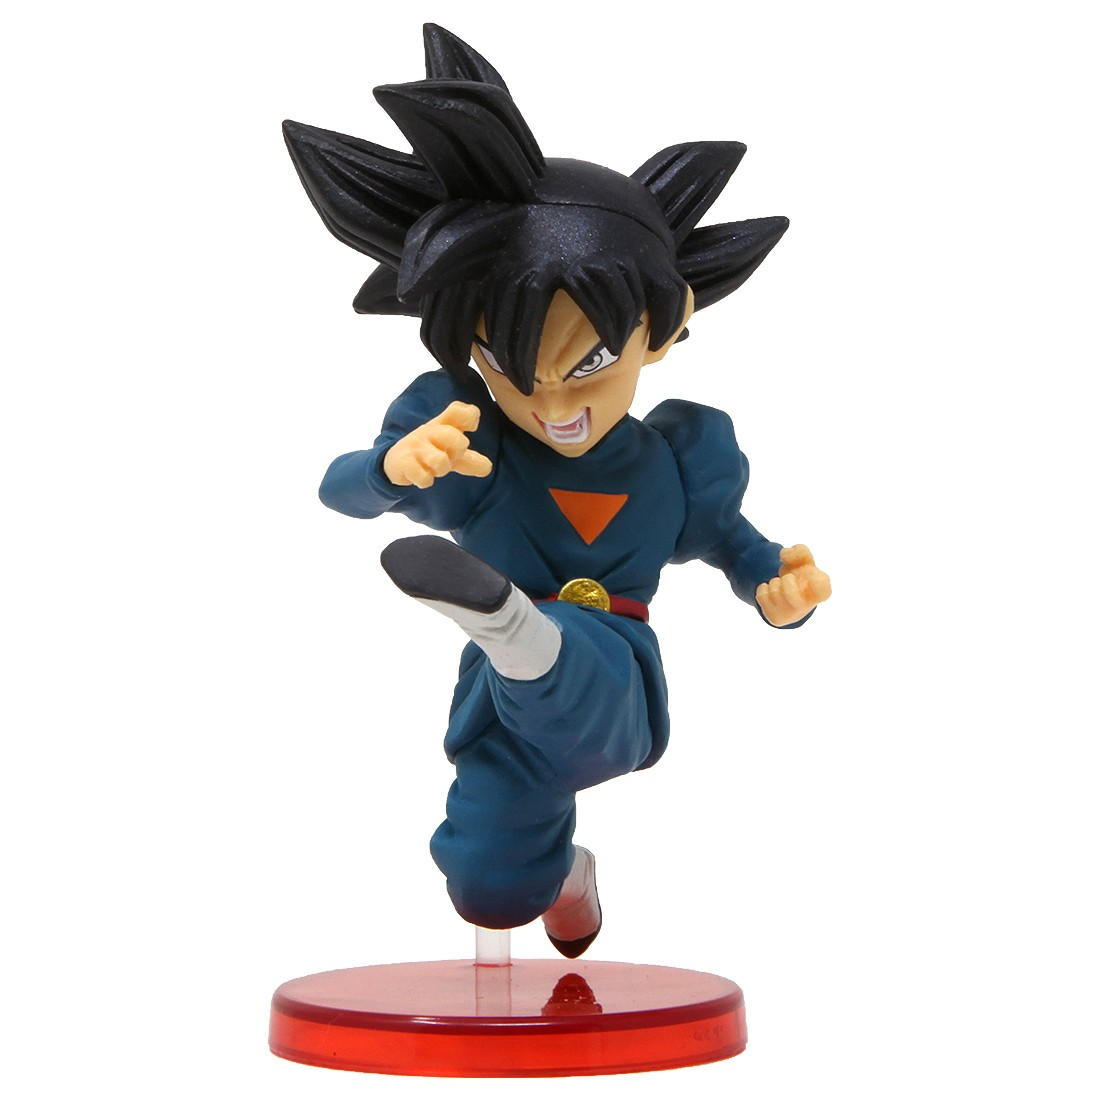 super-dragon-ball-heroes-figurine-goku blue-sdbh-31-wcf-vol-7 1-1